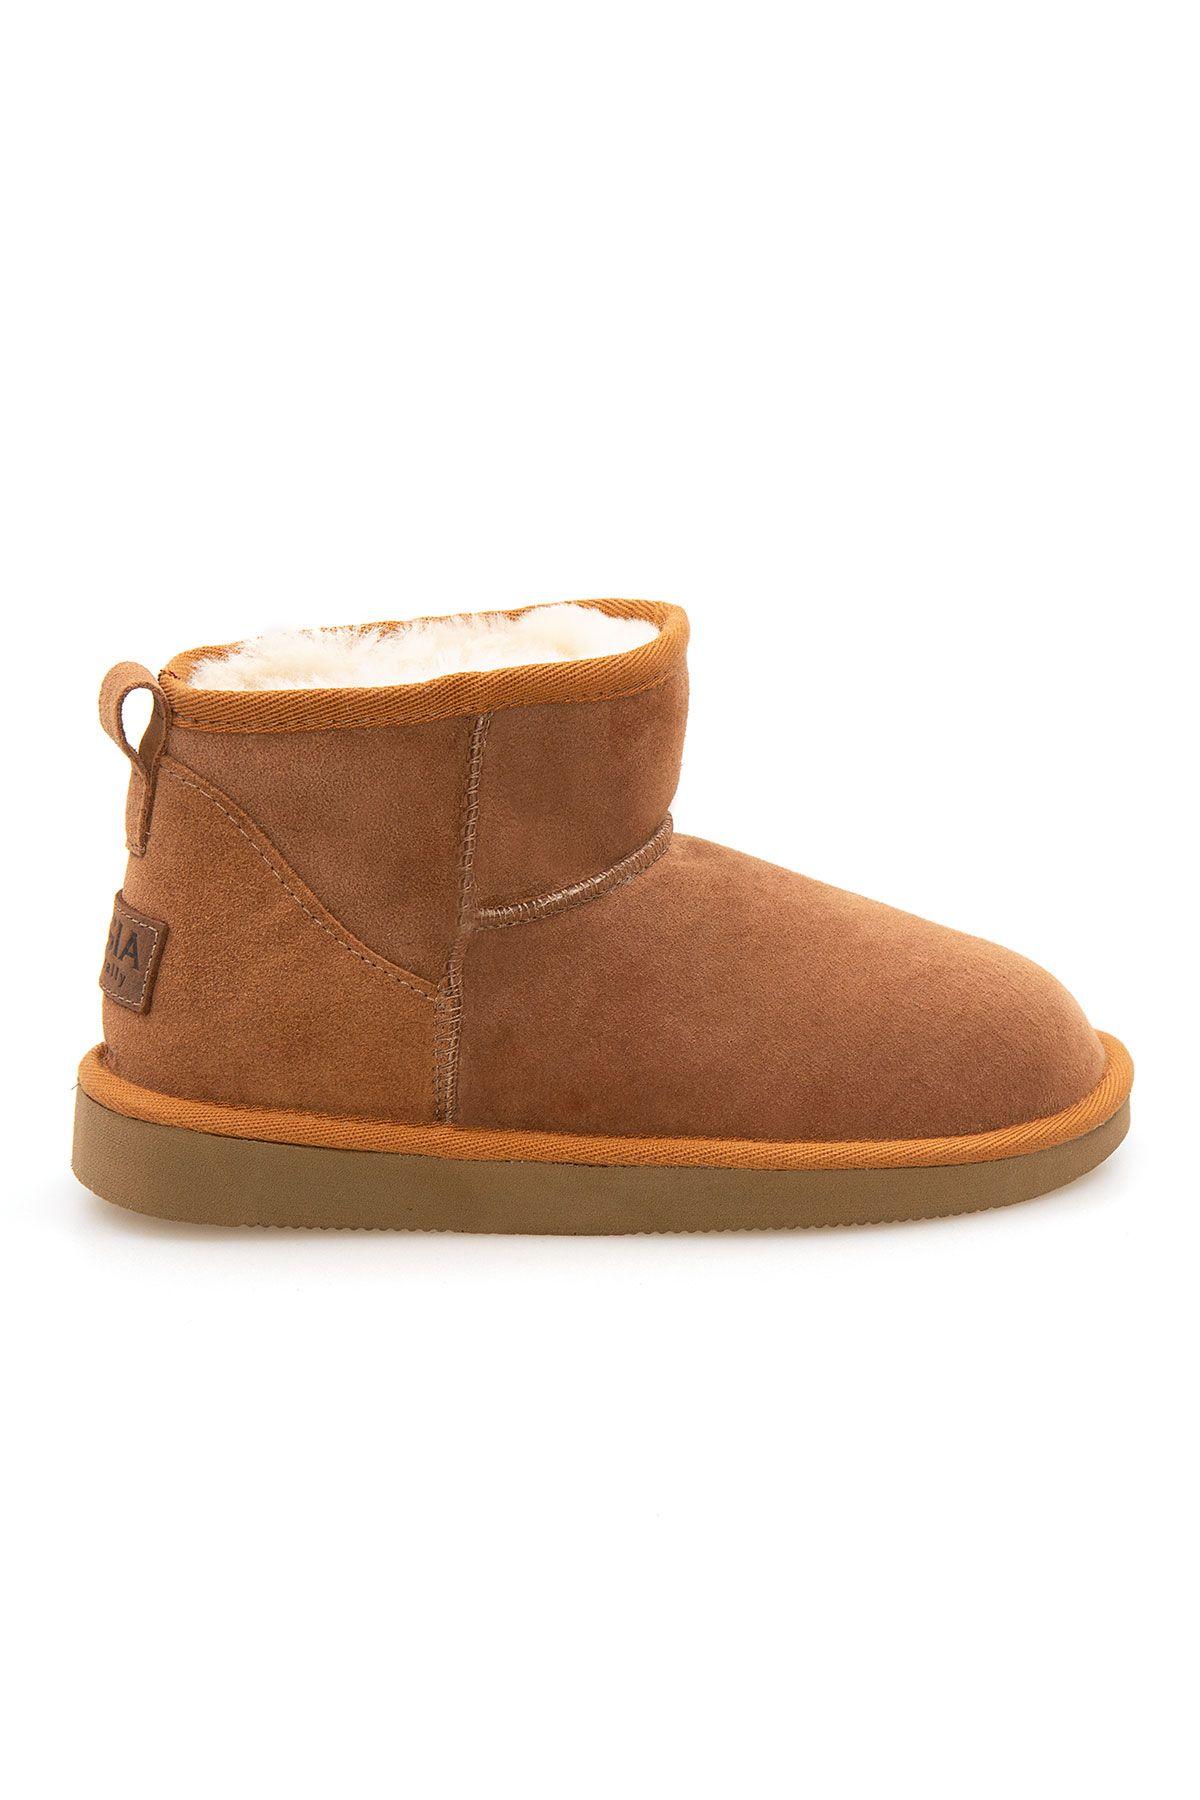 Pegia Genuine Suede Women's Mini Boots 191130 Ginger